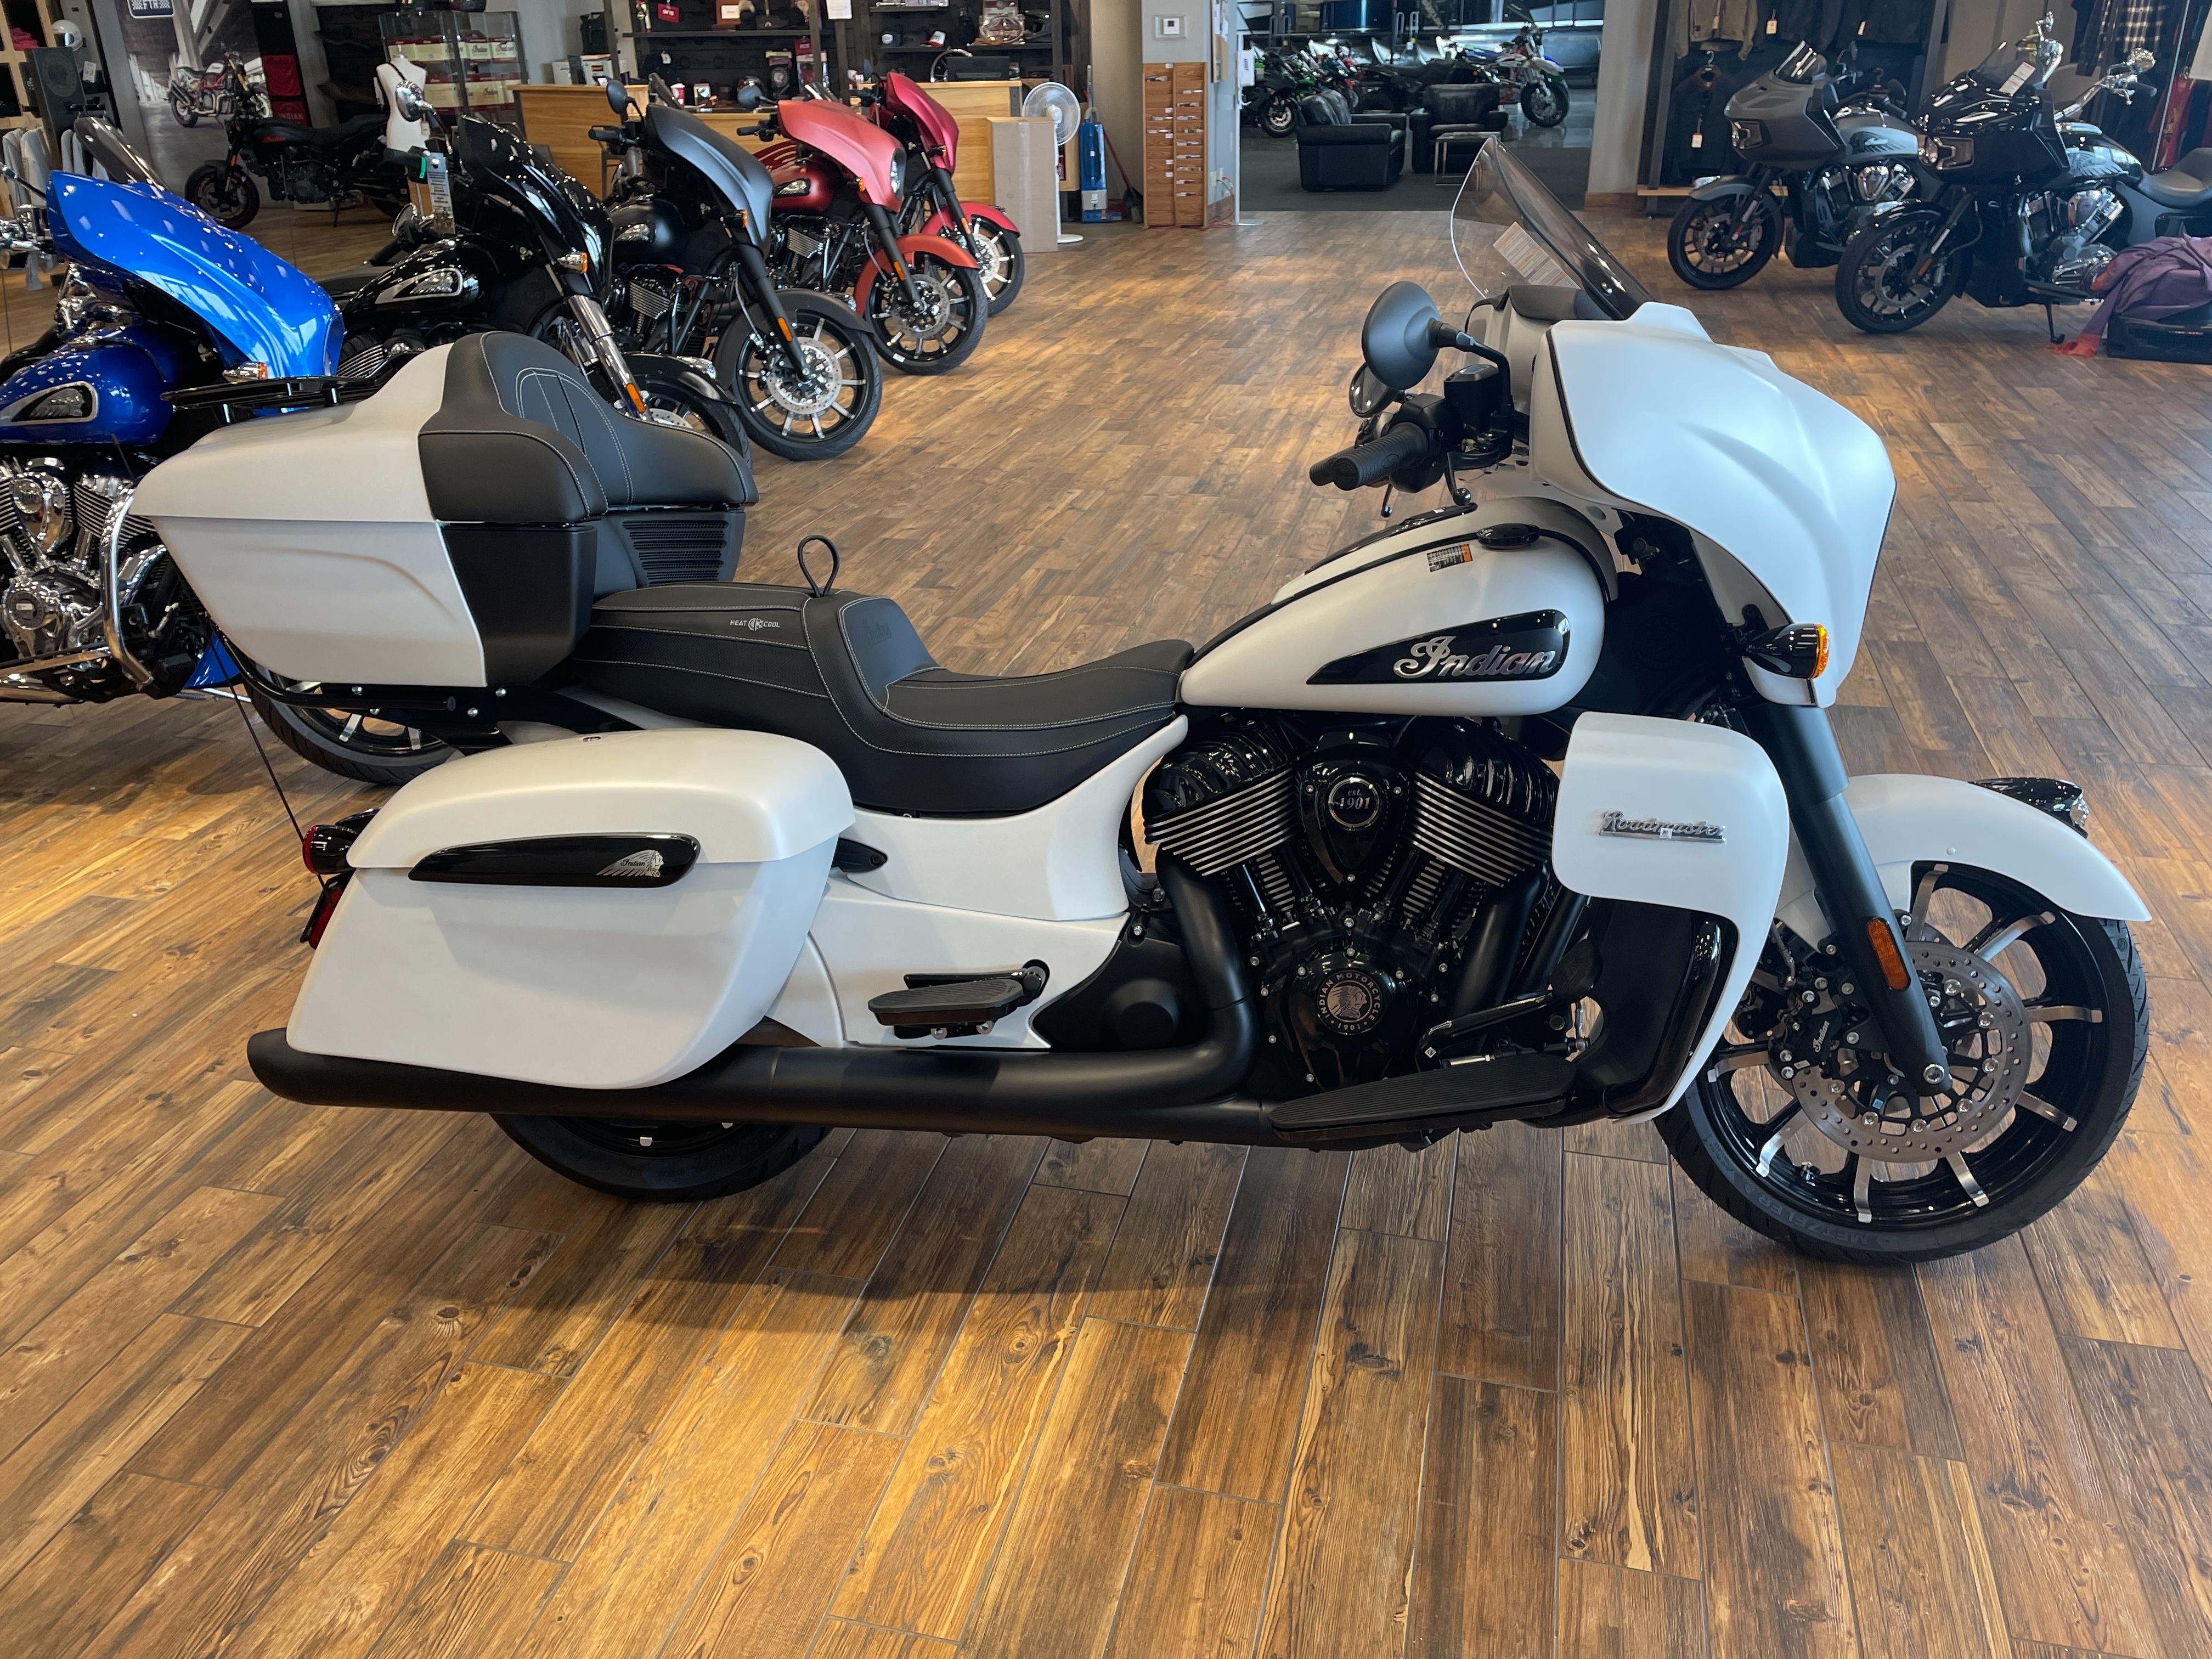 2021 Indian Roadmaster Dark Horse at Youngblood RV & Powersports Springfield Missouri - Ozark MO